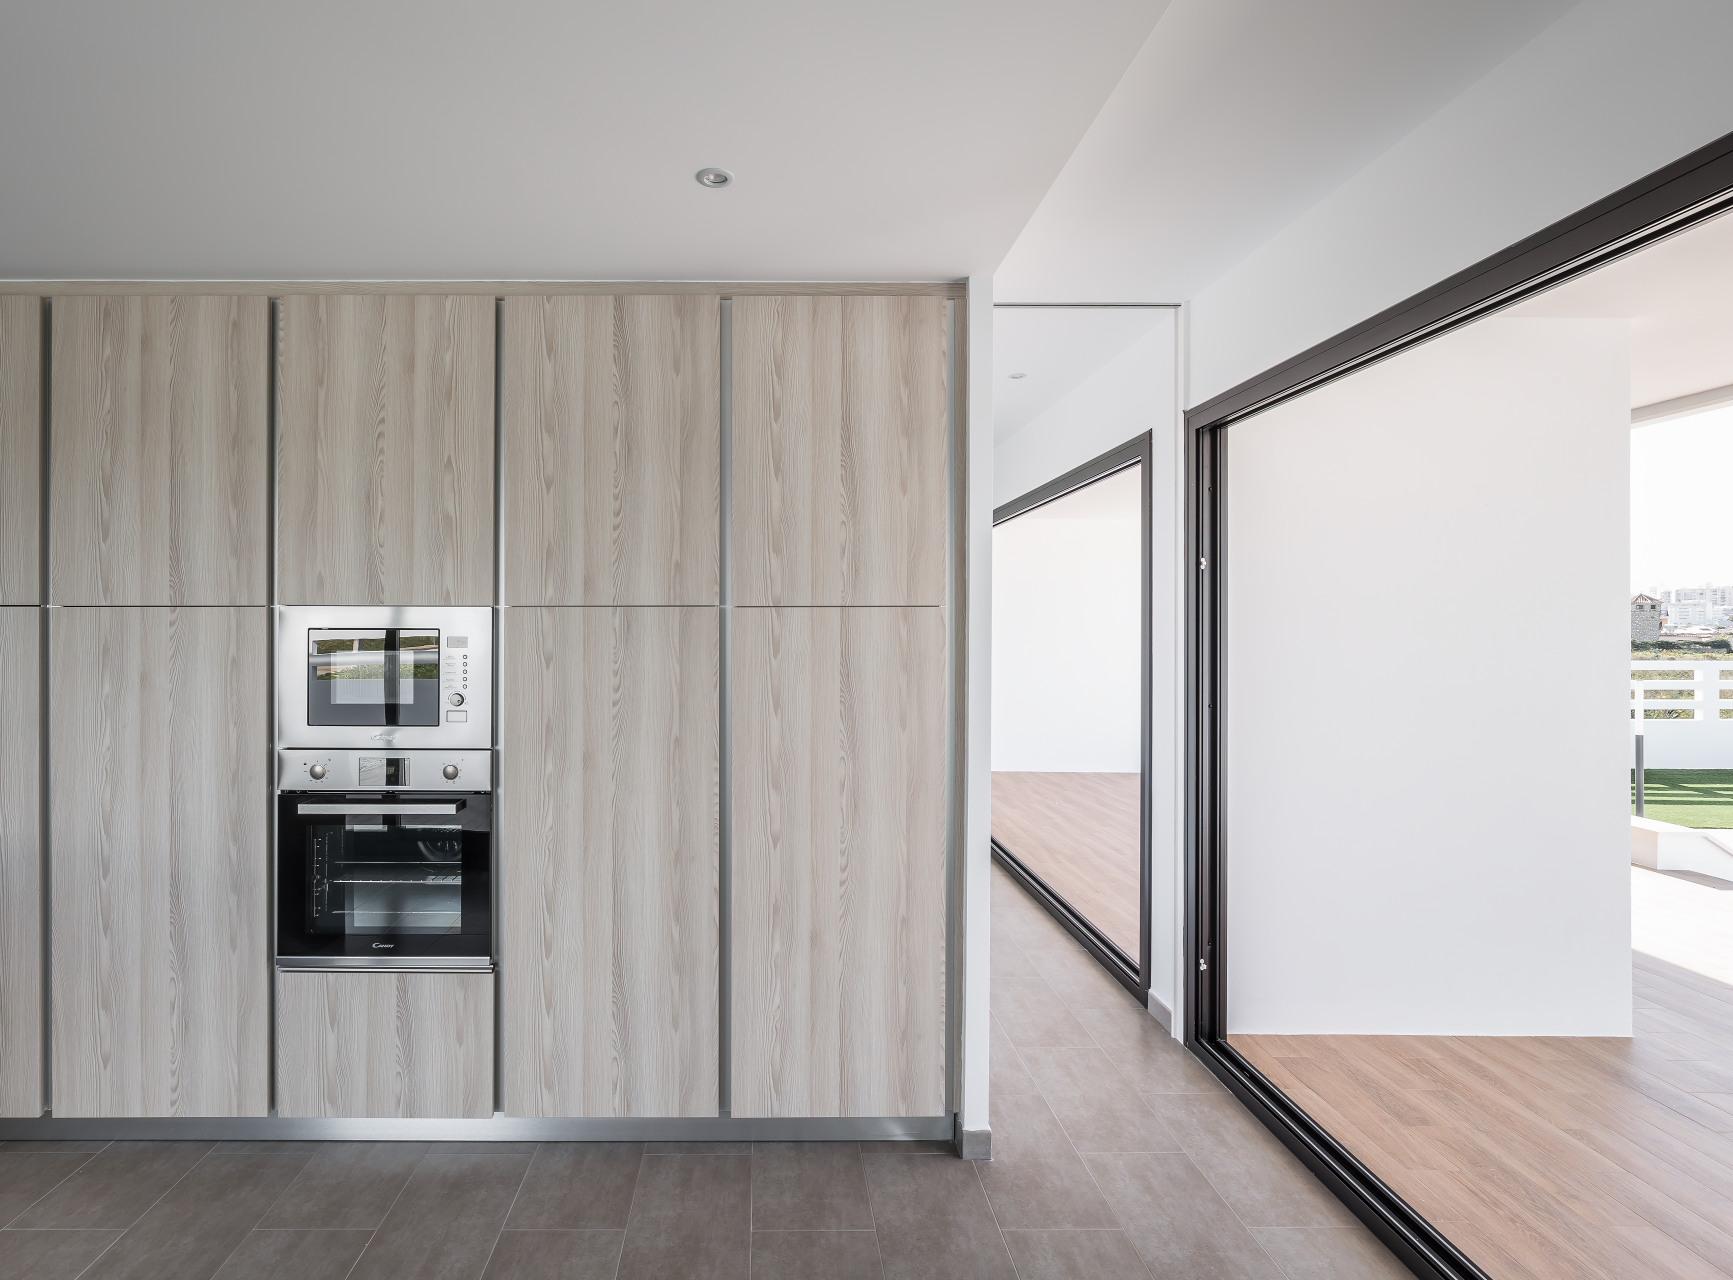 fotografia-arquitectura-valencia-german-cabo-viraje-vivienda-unifamiliar-calpe (29)